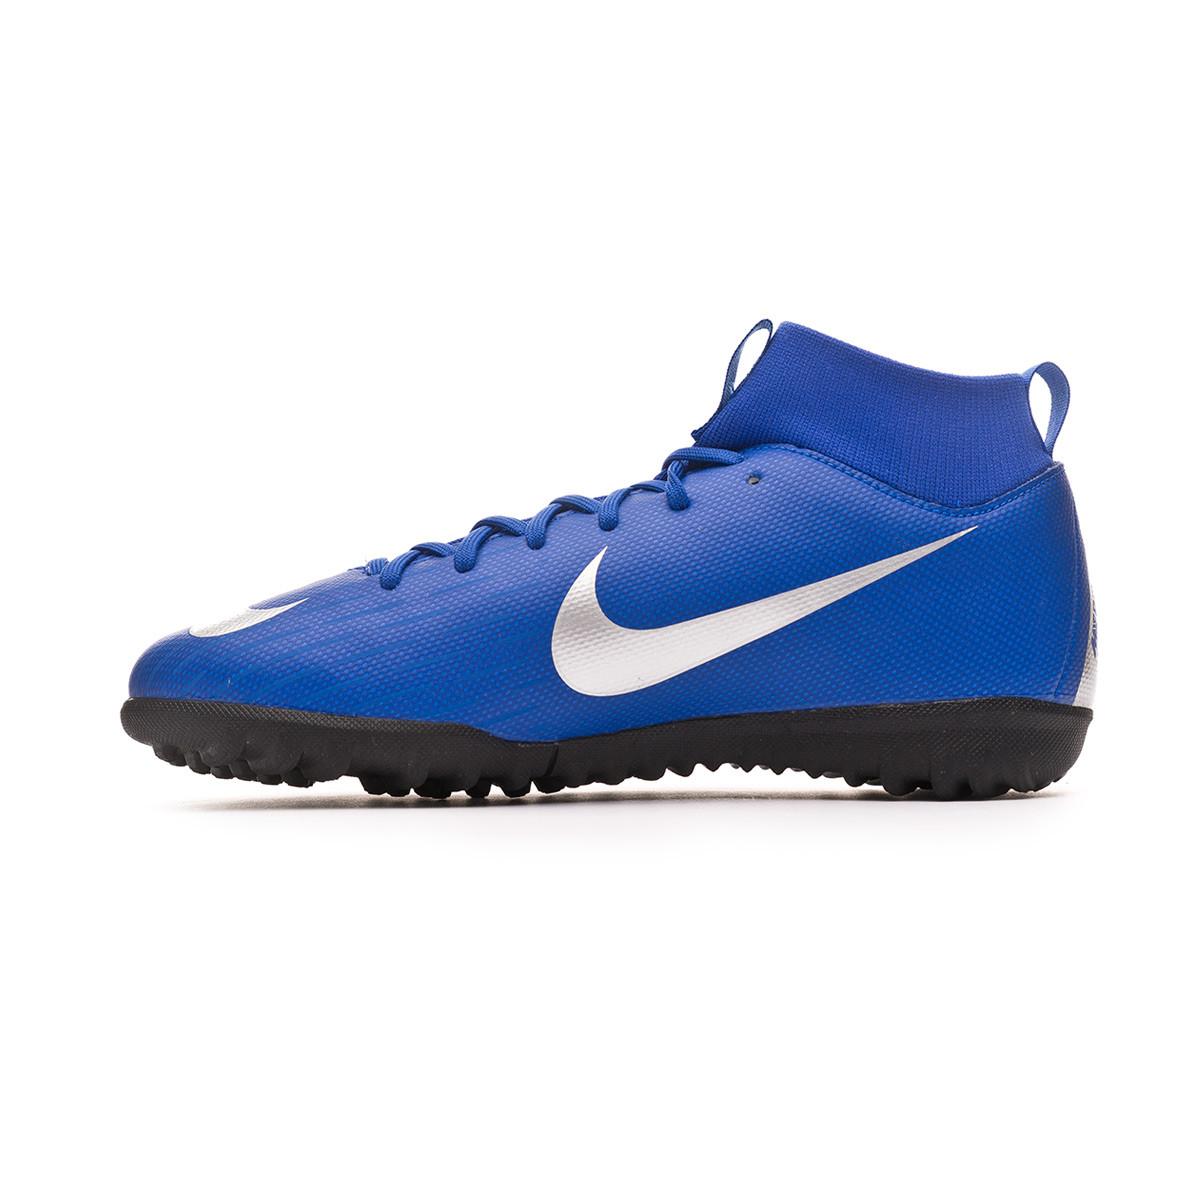 e64033f82df Football Boot Nike Kids Mercurial SuperflyX VI Academy Turf Racer  blue-Metallic silver-Black-Volt - Tienda de fútbol Fútbol Emotion